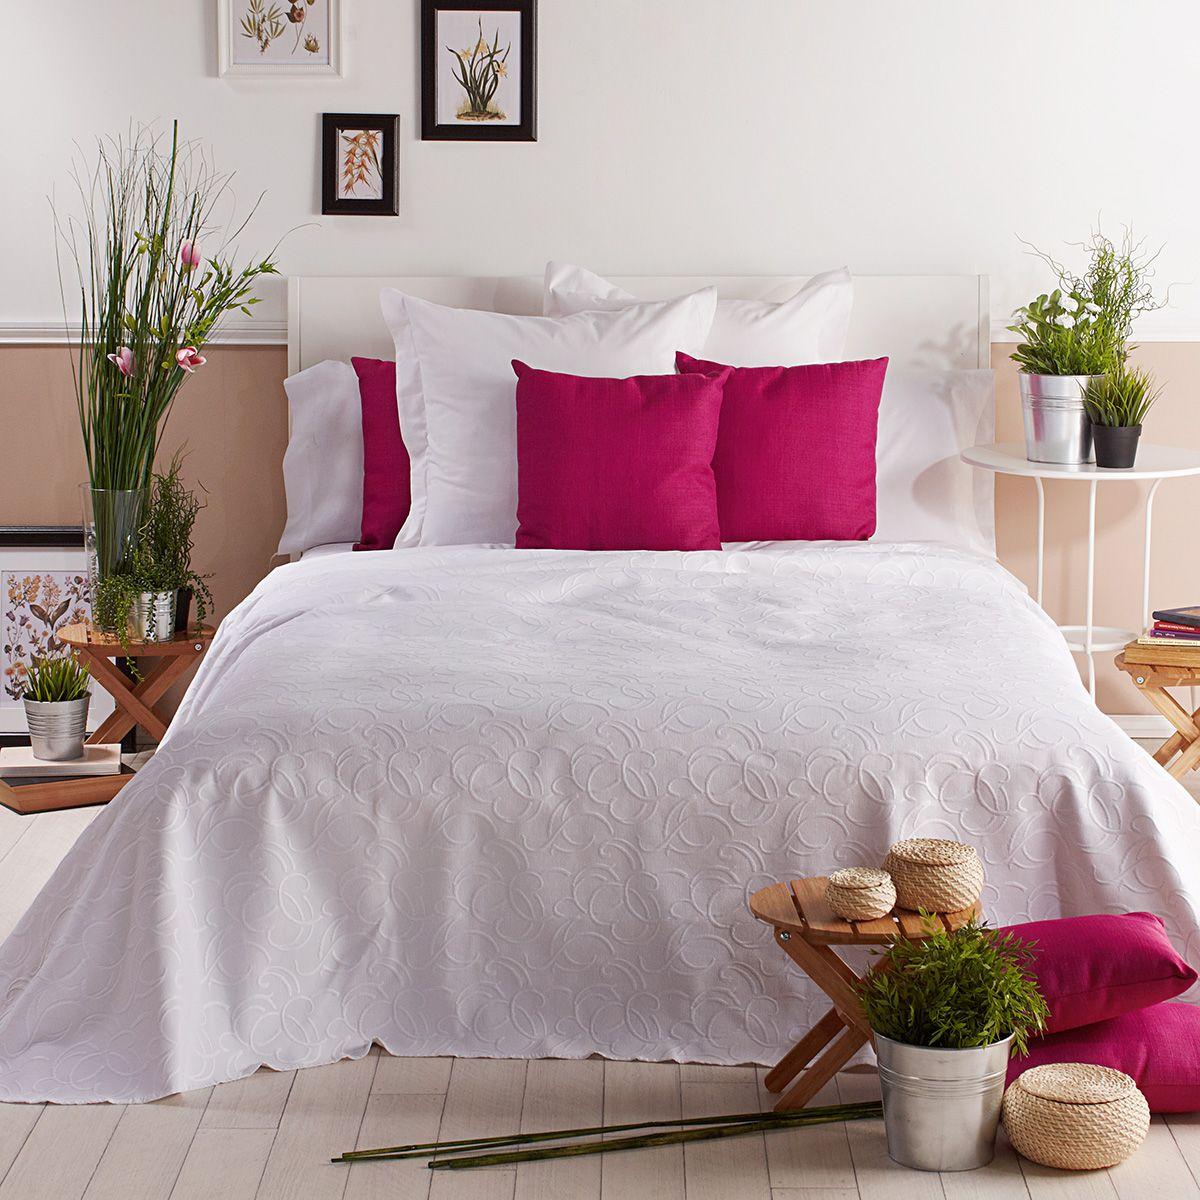 Colcha piqu vallarta colchas de verano pinterest - Ikea ropa de cama colchas ...